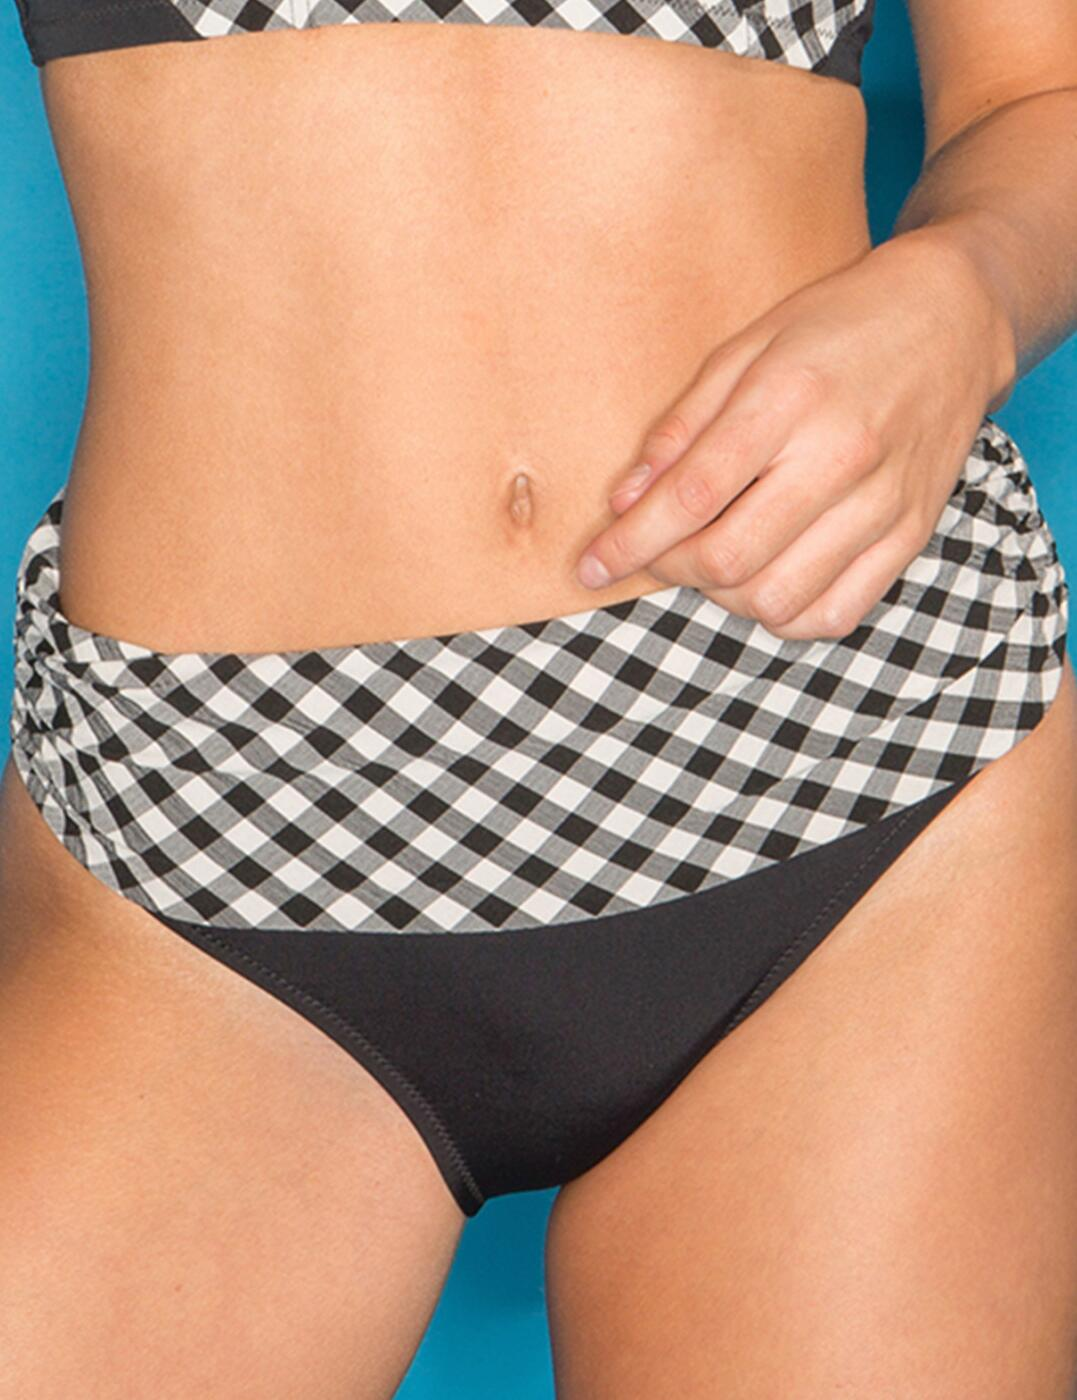 67003 Pour Moi? Checkers Fold Bikini Brief - 67003 Black/White